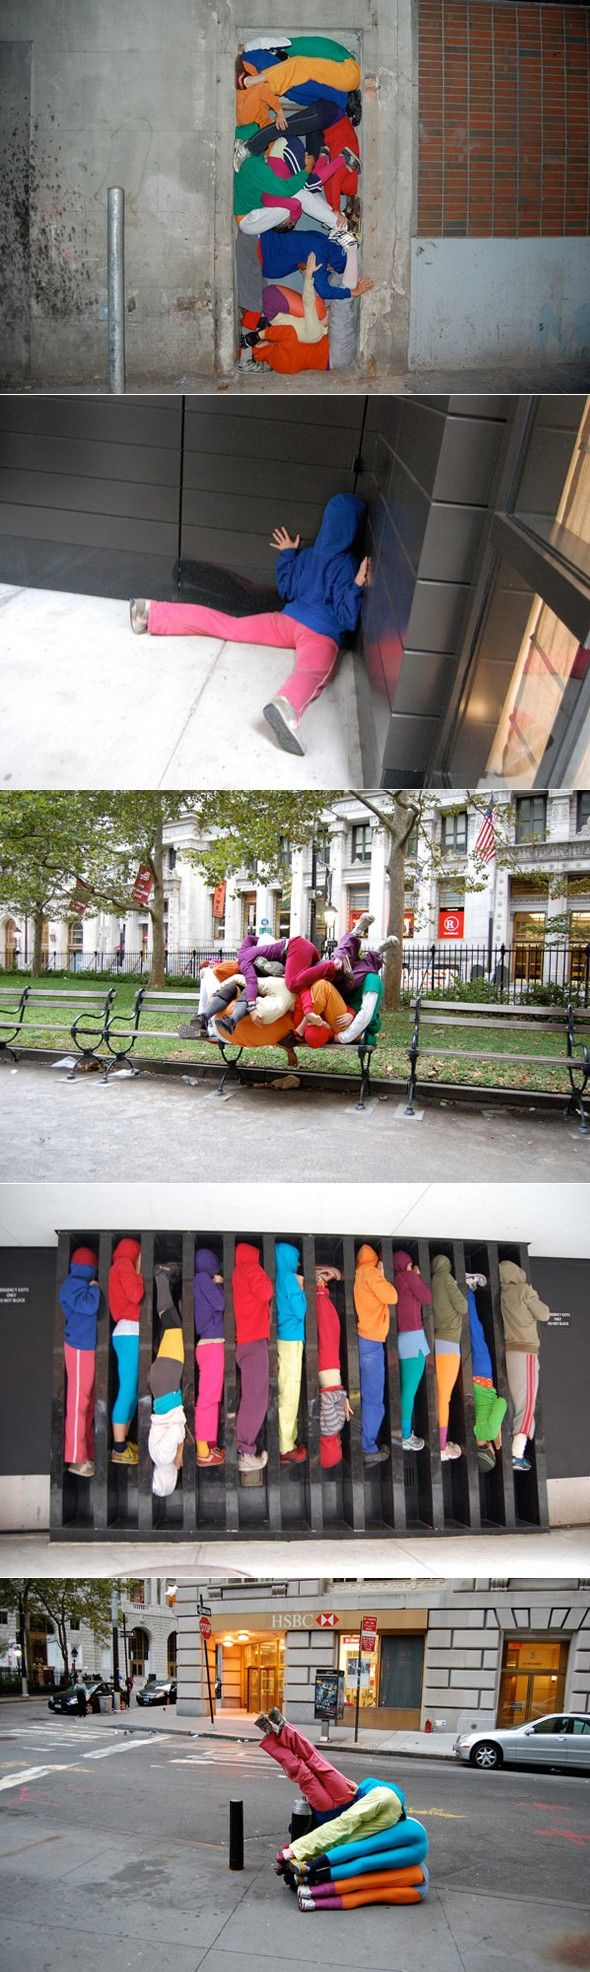 http://www.journal-du-design.fr/wp-content/thumbnails/uploads/2011/01/Bodies-in-urban-space-Willi-Dorner-2-tt-width-590-height-1972-crop-1-b...